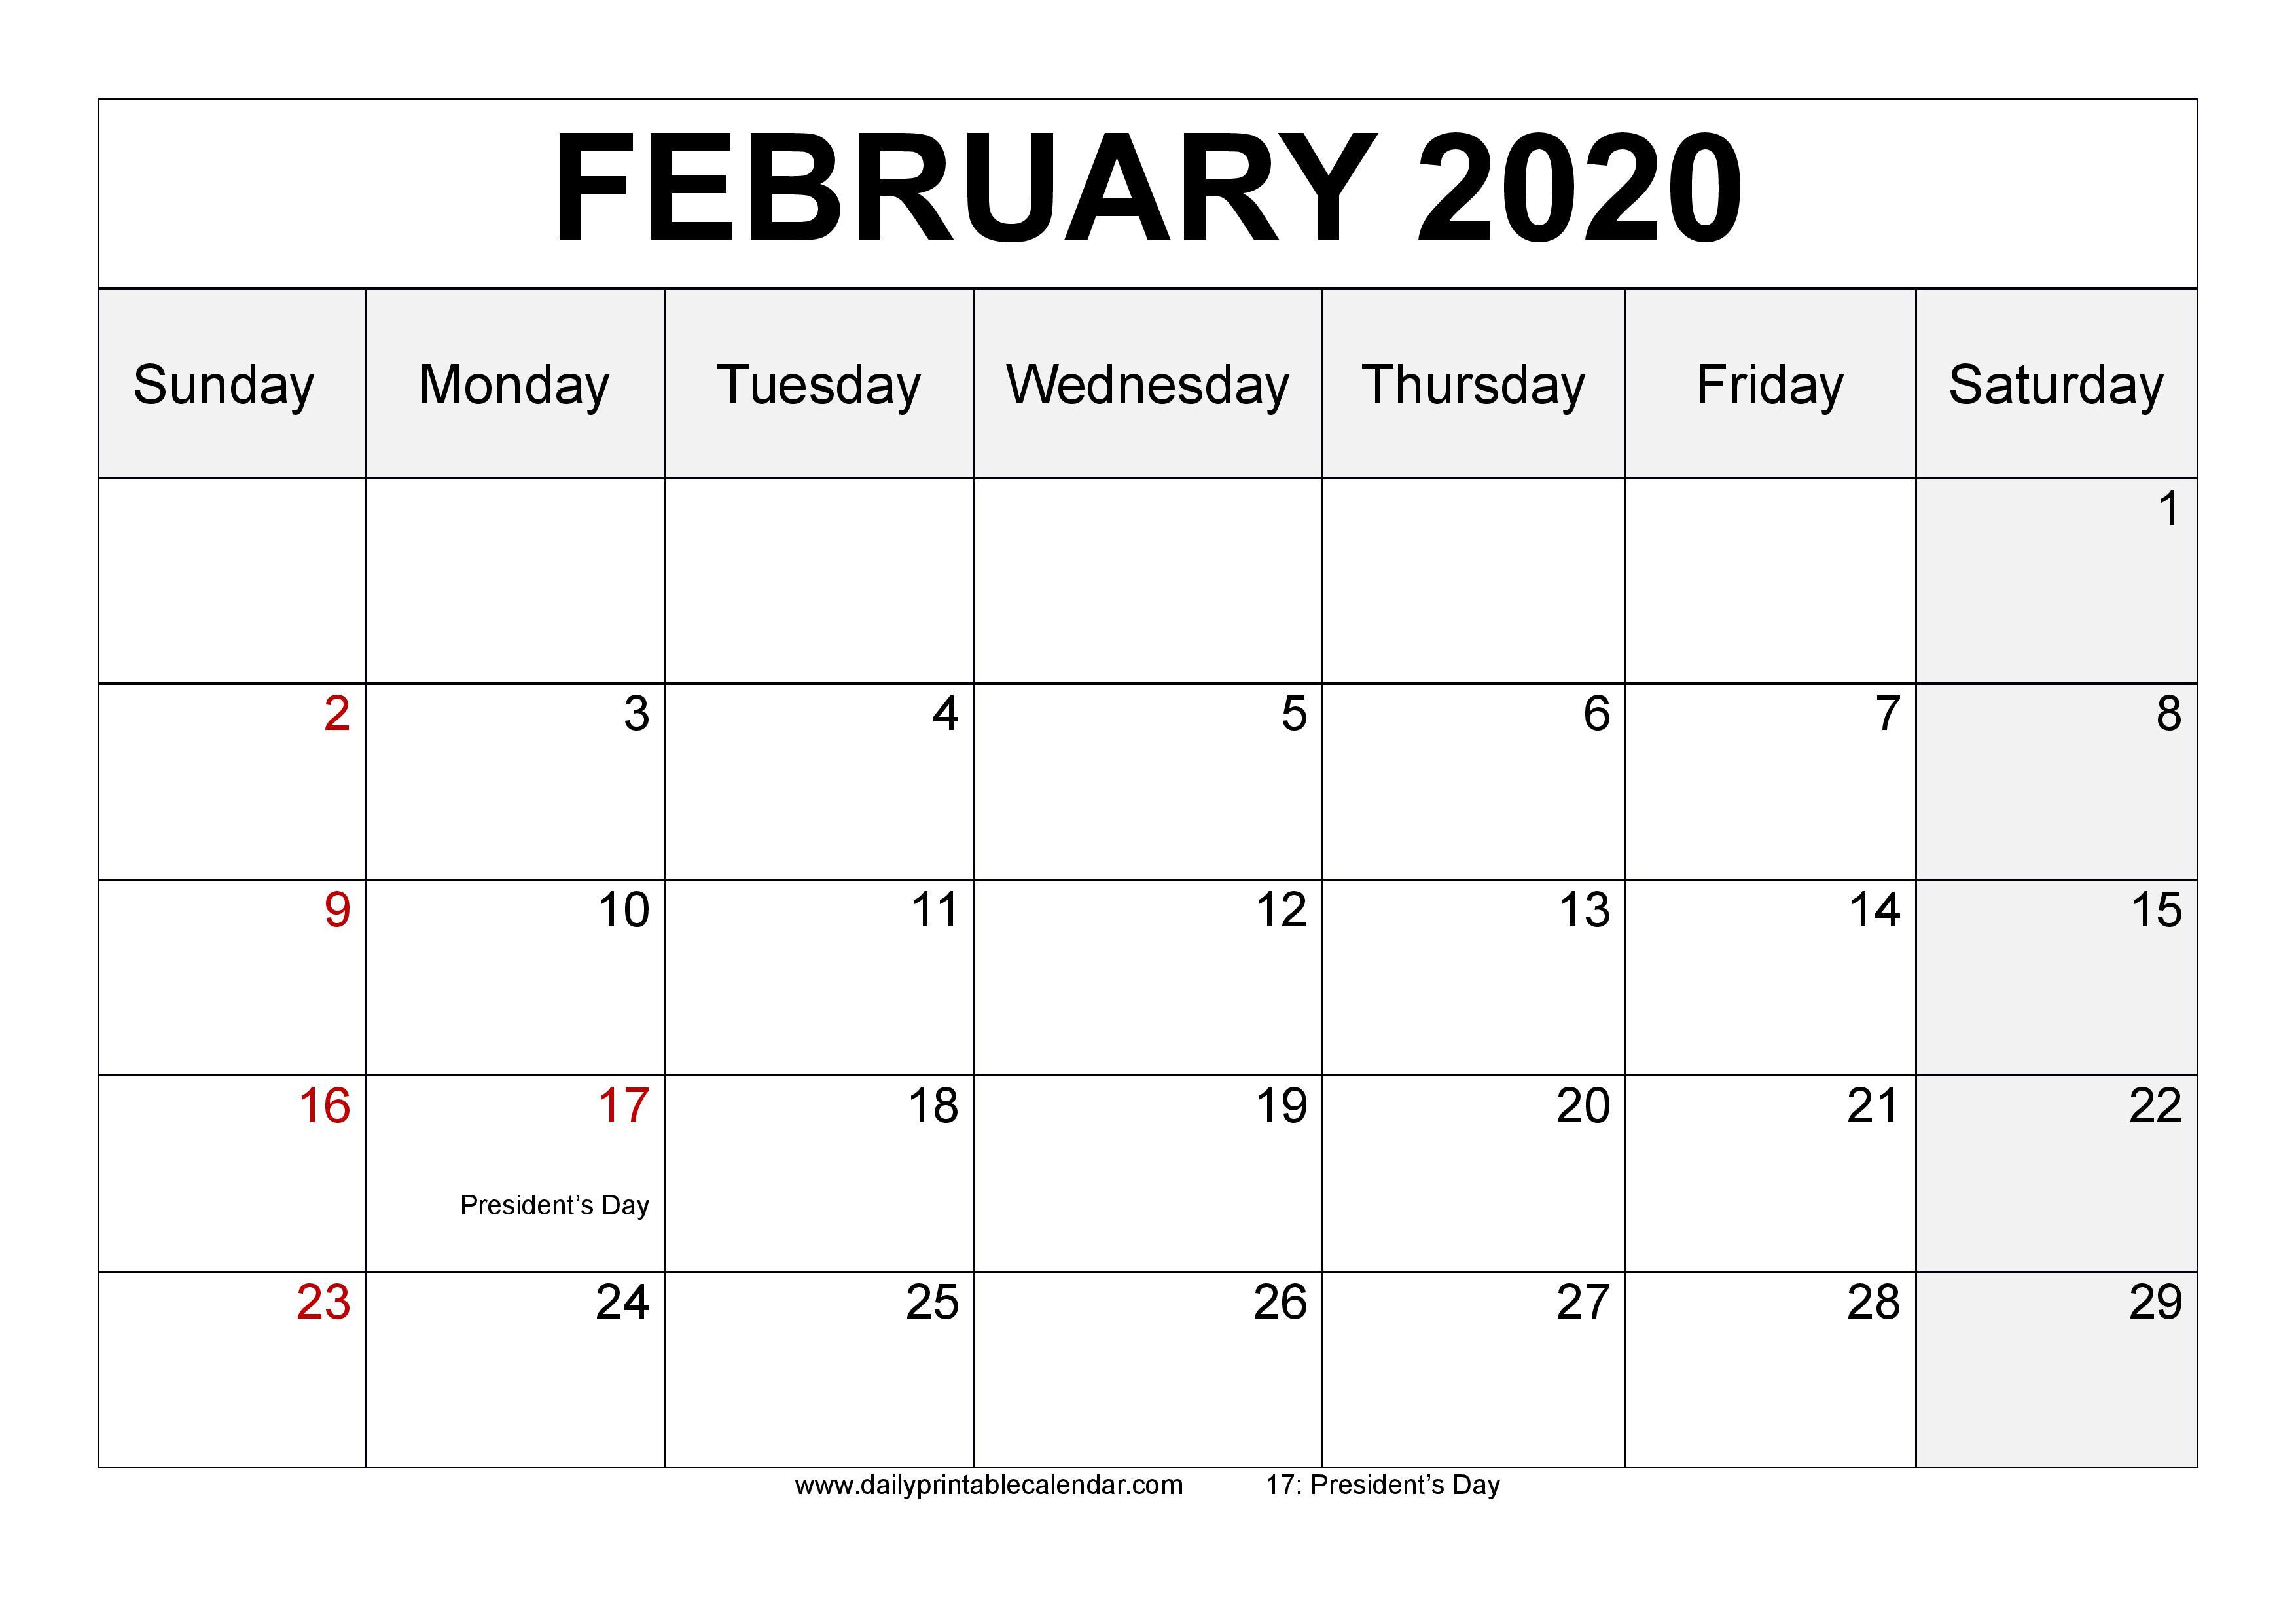 February 2020 Calendar Printable  Blank Templates  2020 intended for 2020 Calendar Template Monday Start